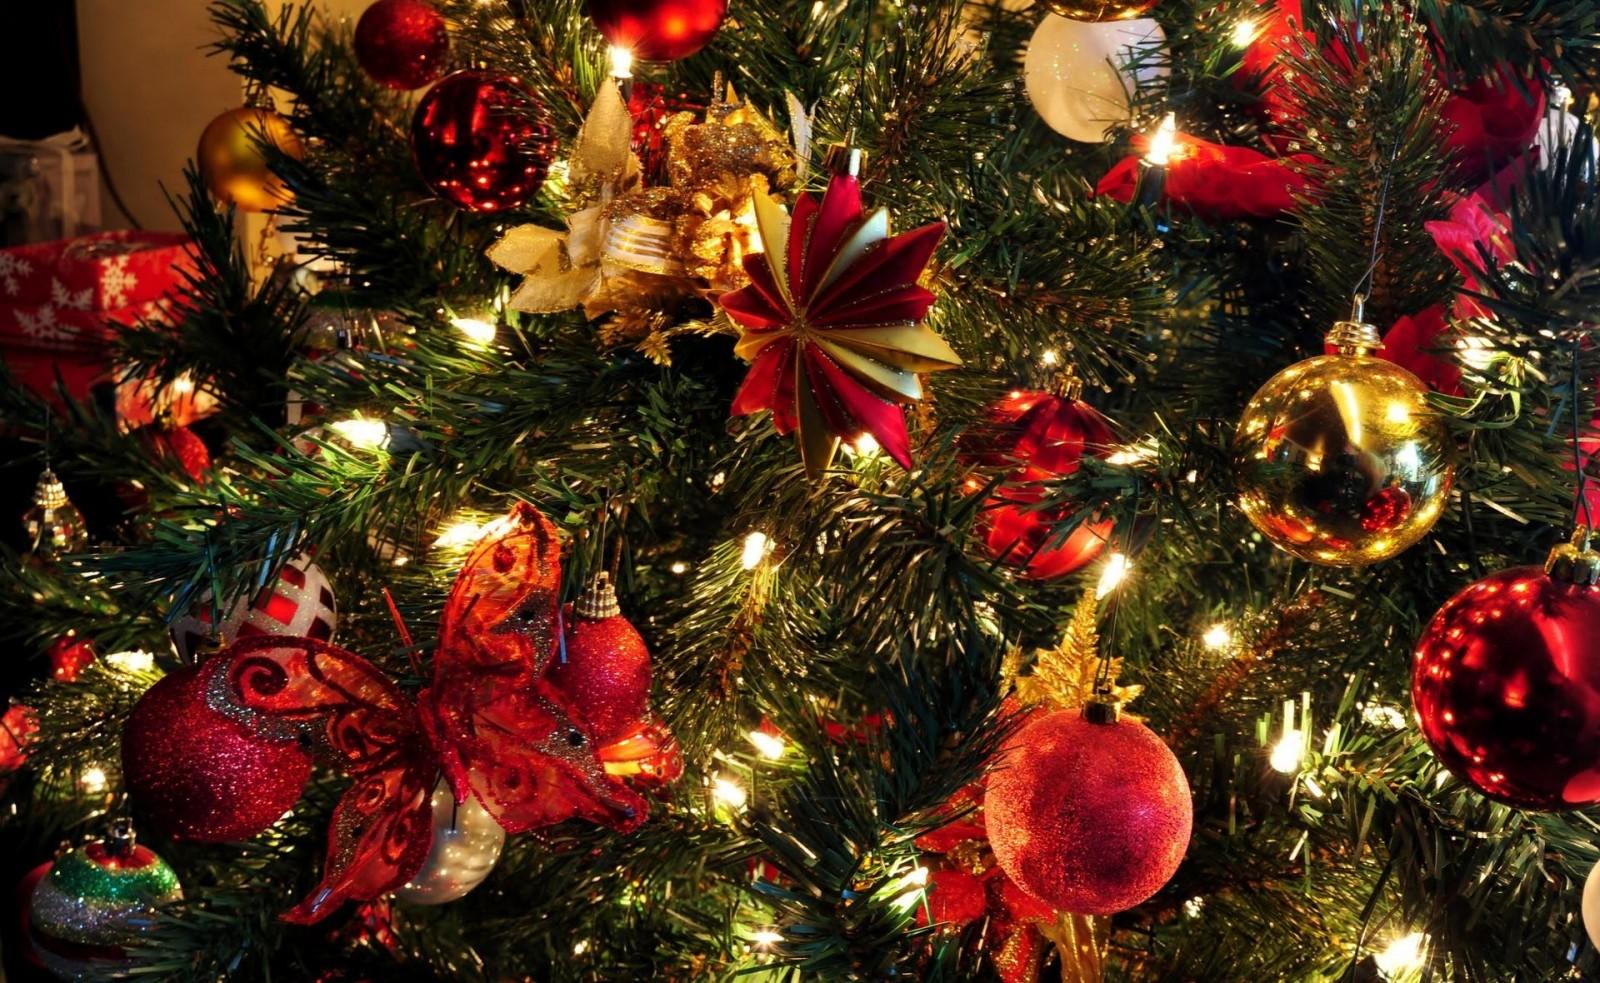 Готовимся к Новогодней ночи по знаку Зодиака